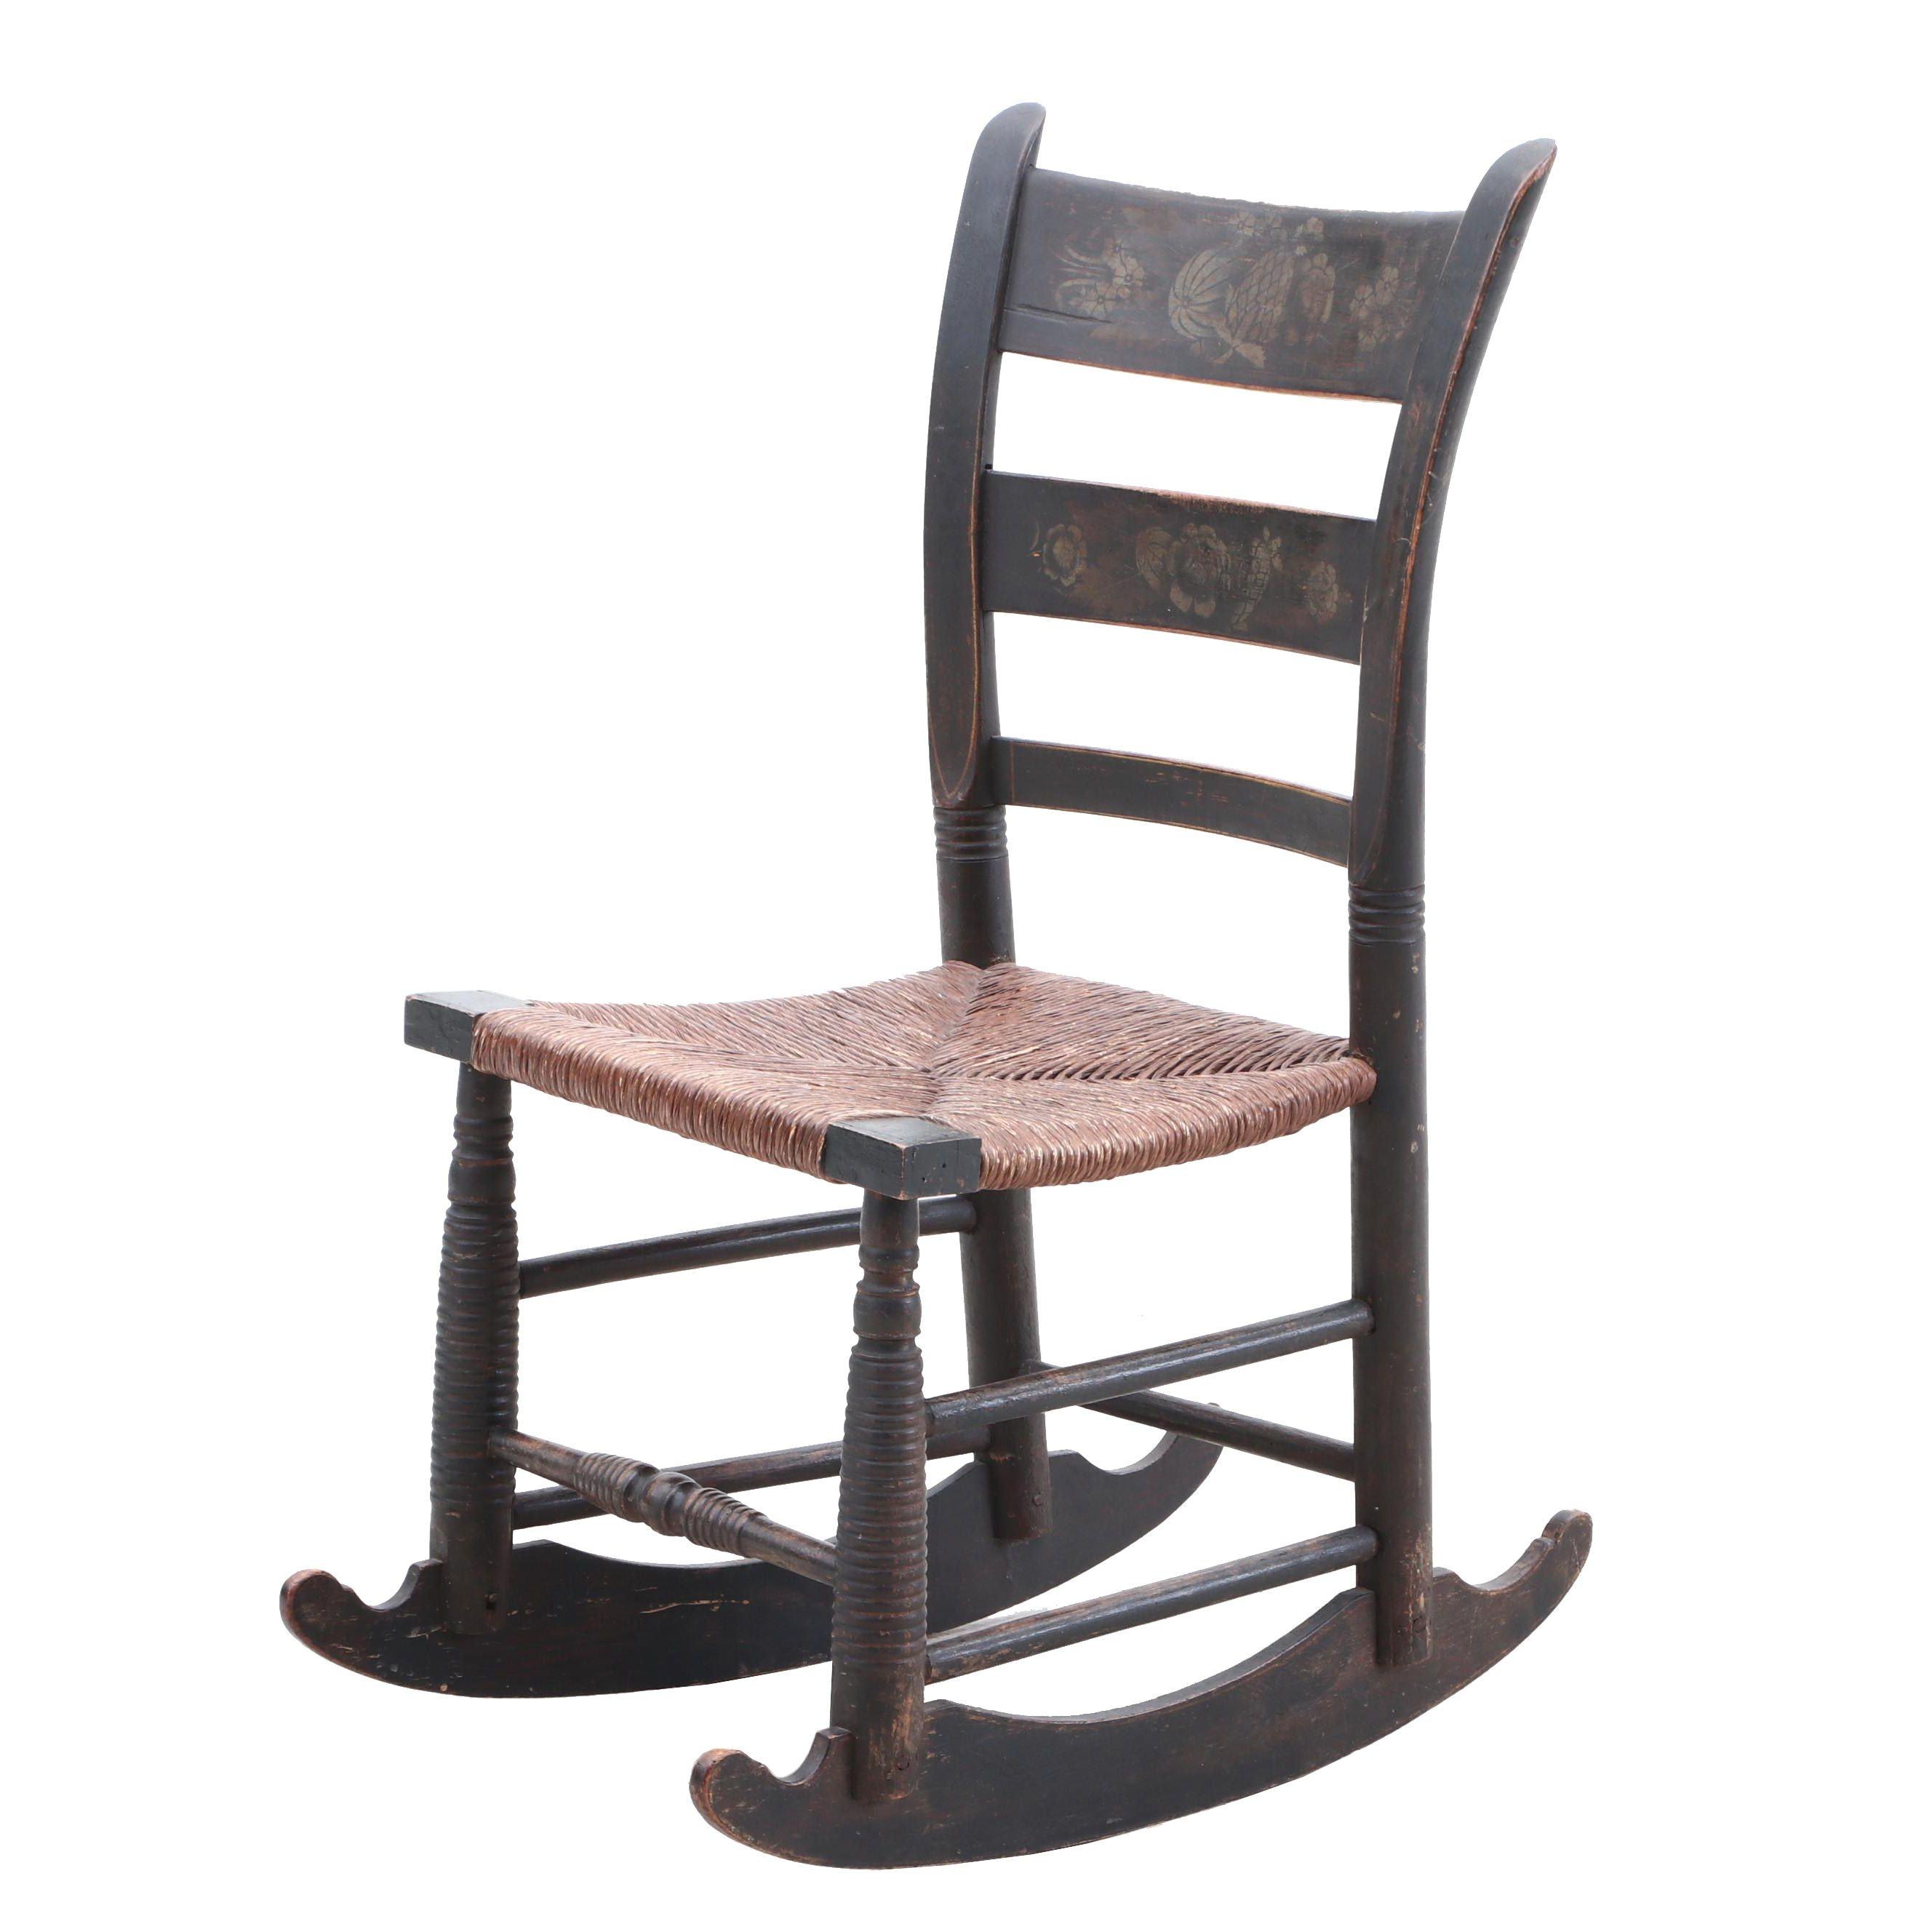 Ebonized and Gilt Stenciled Rocking Chair, Mid19th Century